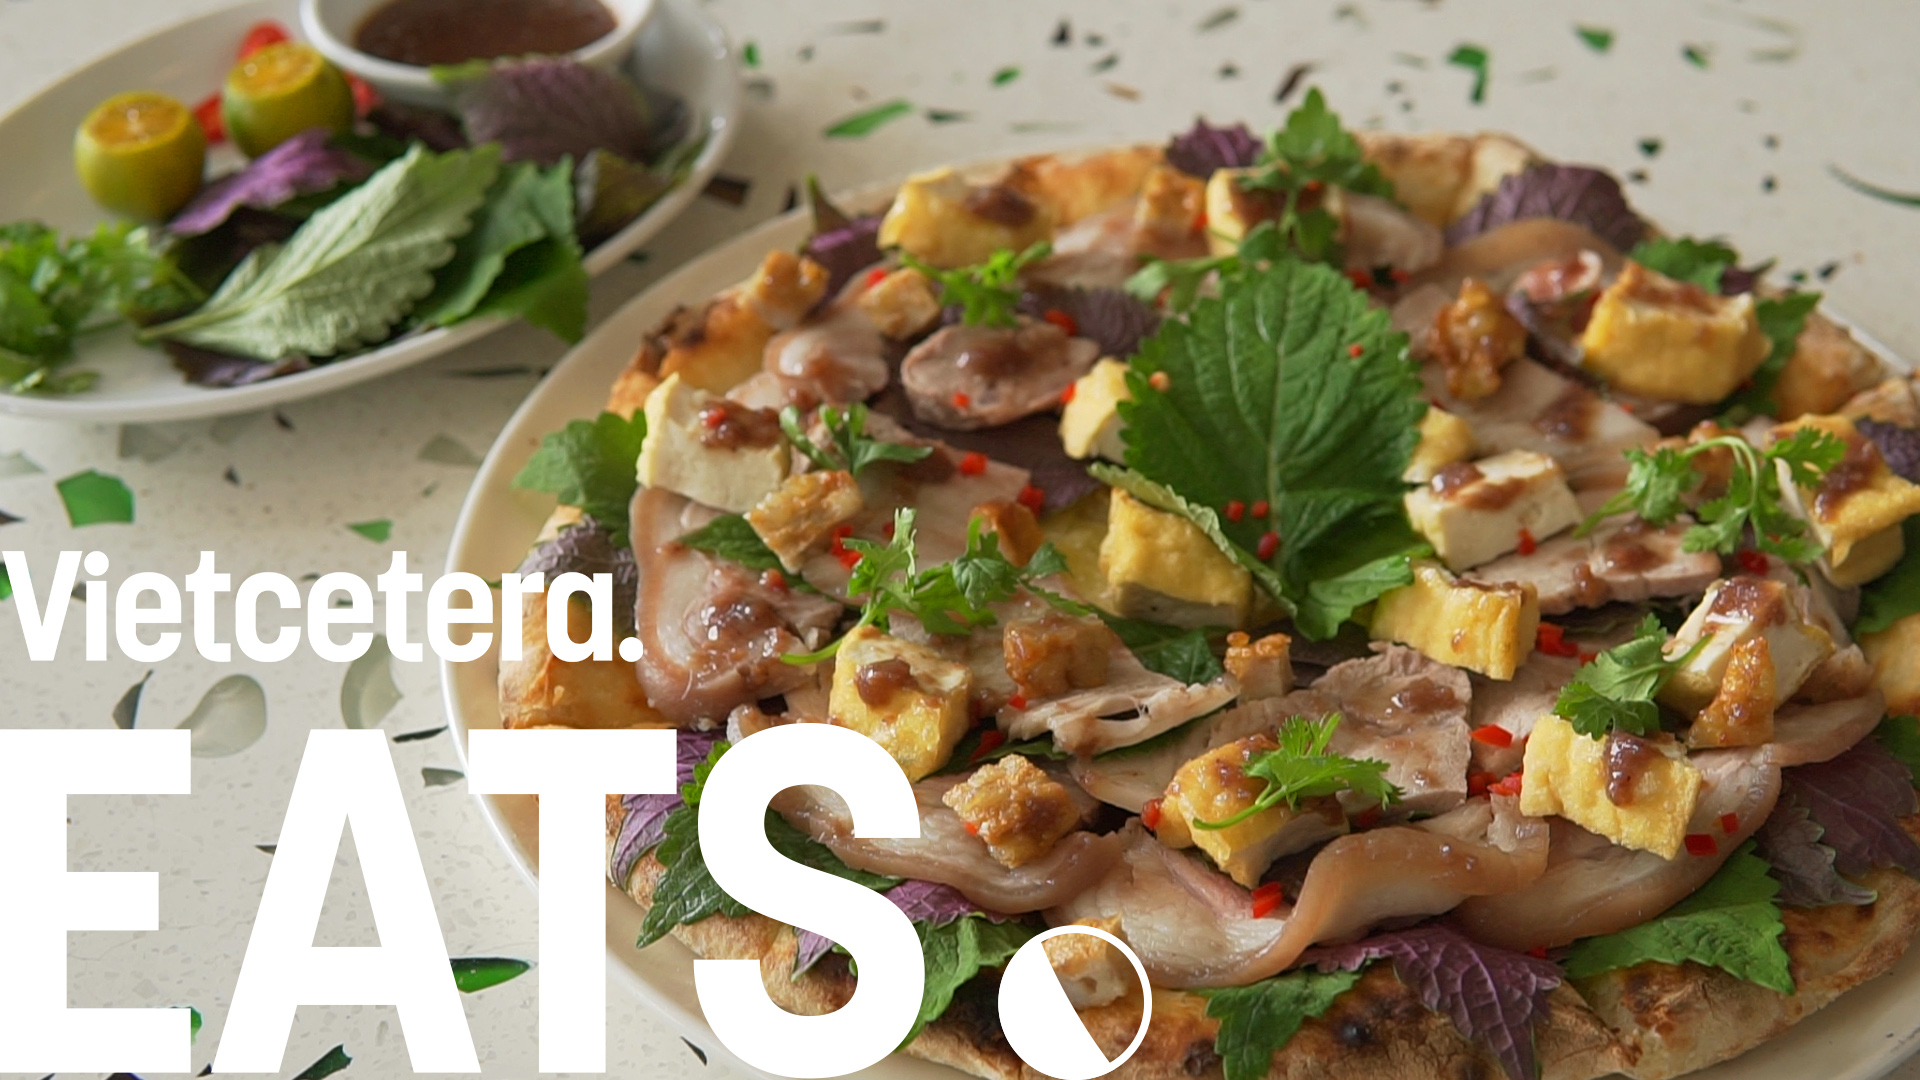 Pizza Bun Dau Mam Tom: Taking Fusion Cuisine To The Next Level | Vietcetera EATS